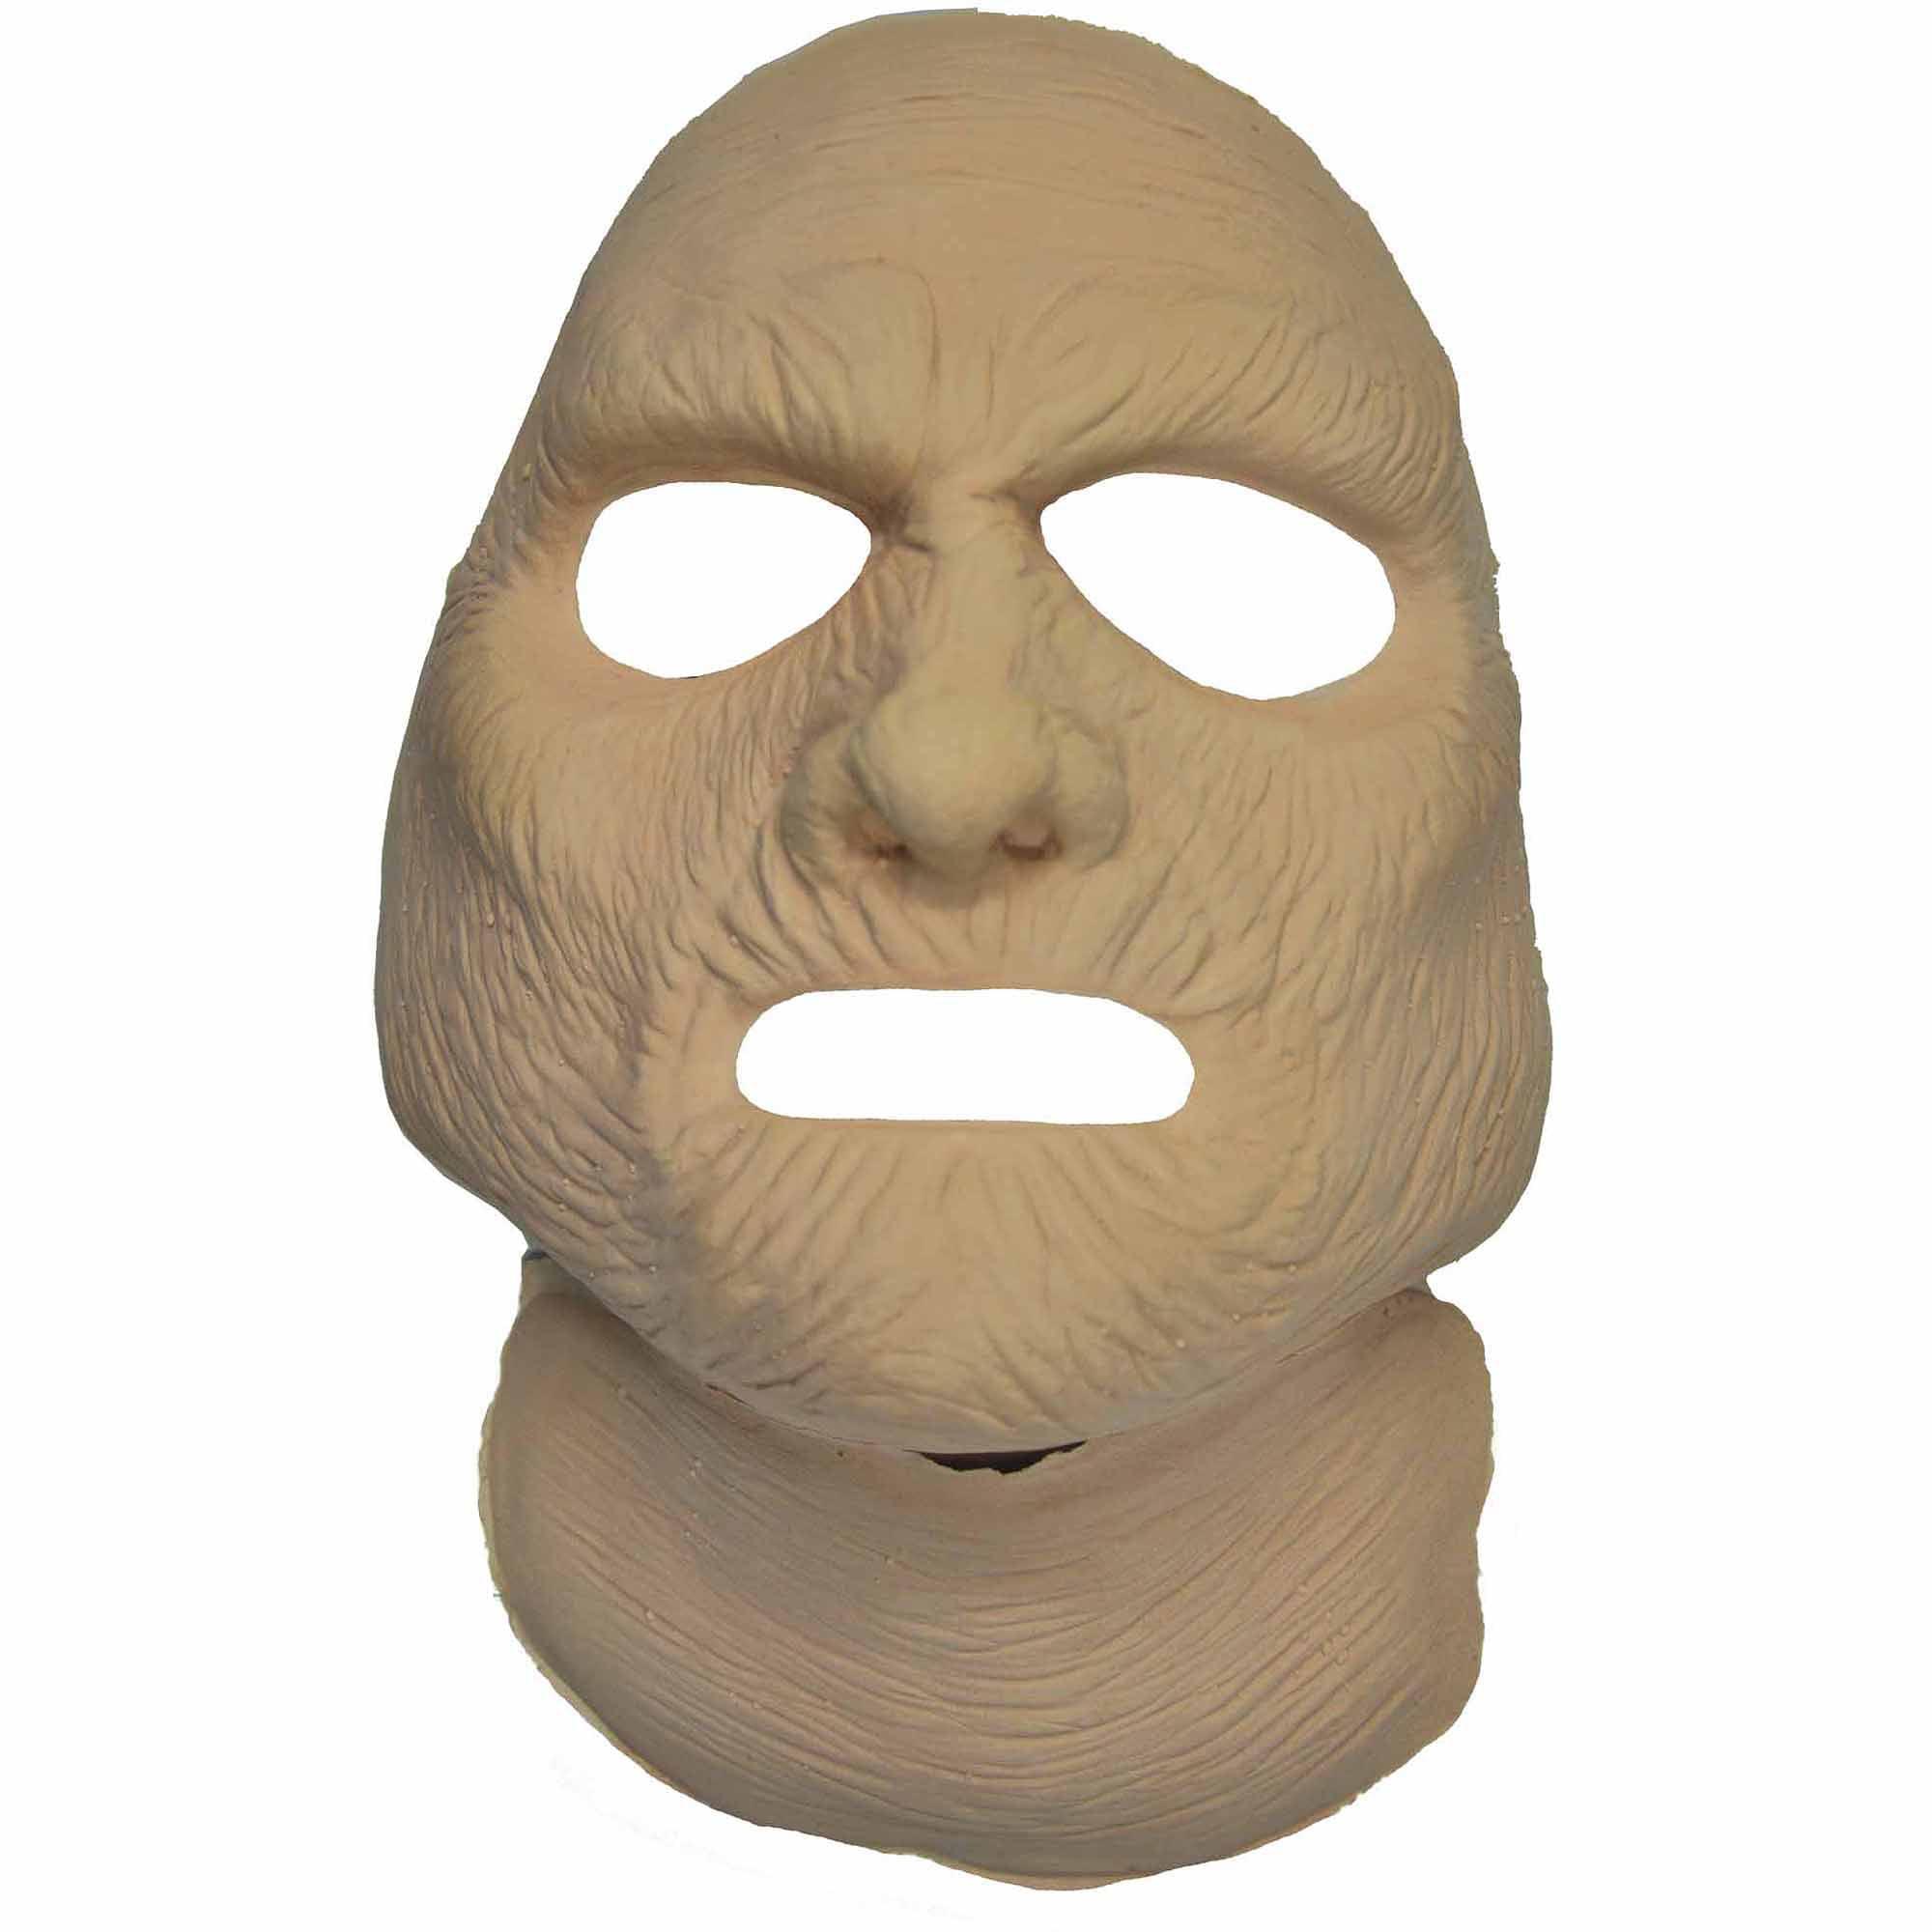 Mummy Foam Latex Face Adult Halloween Accessory